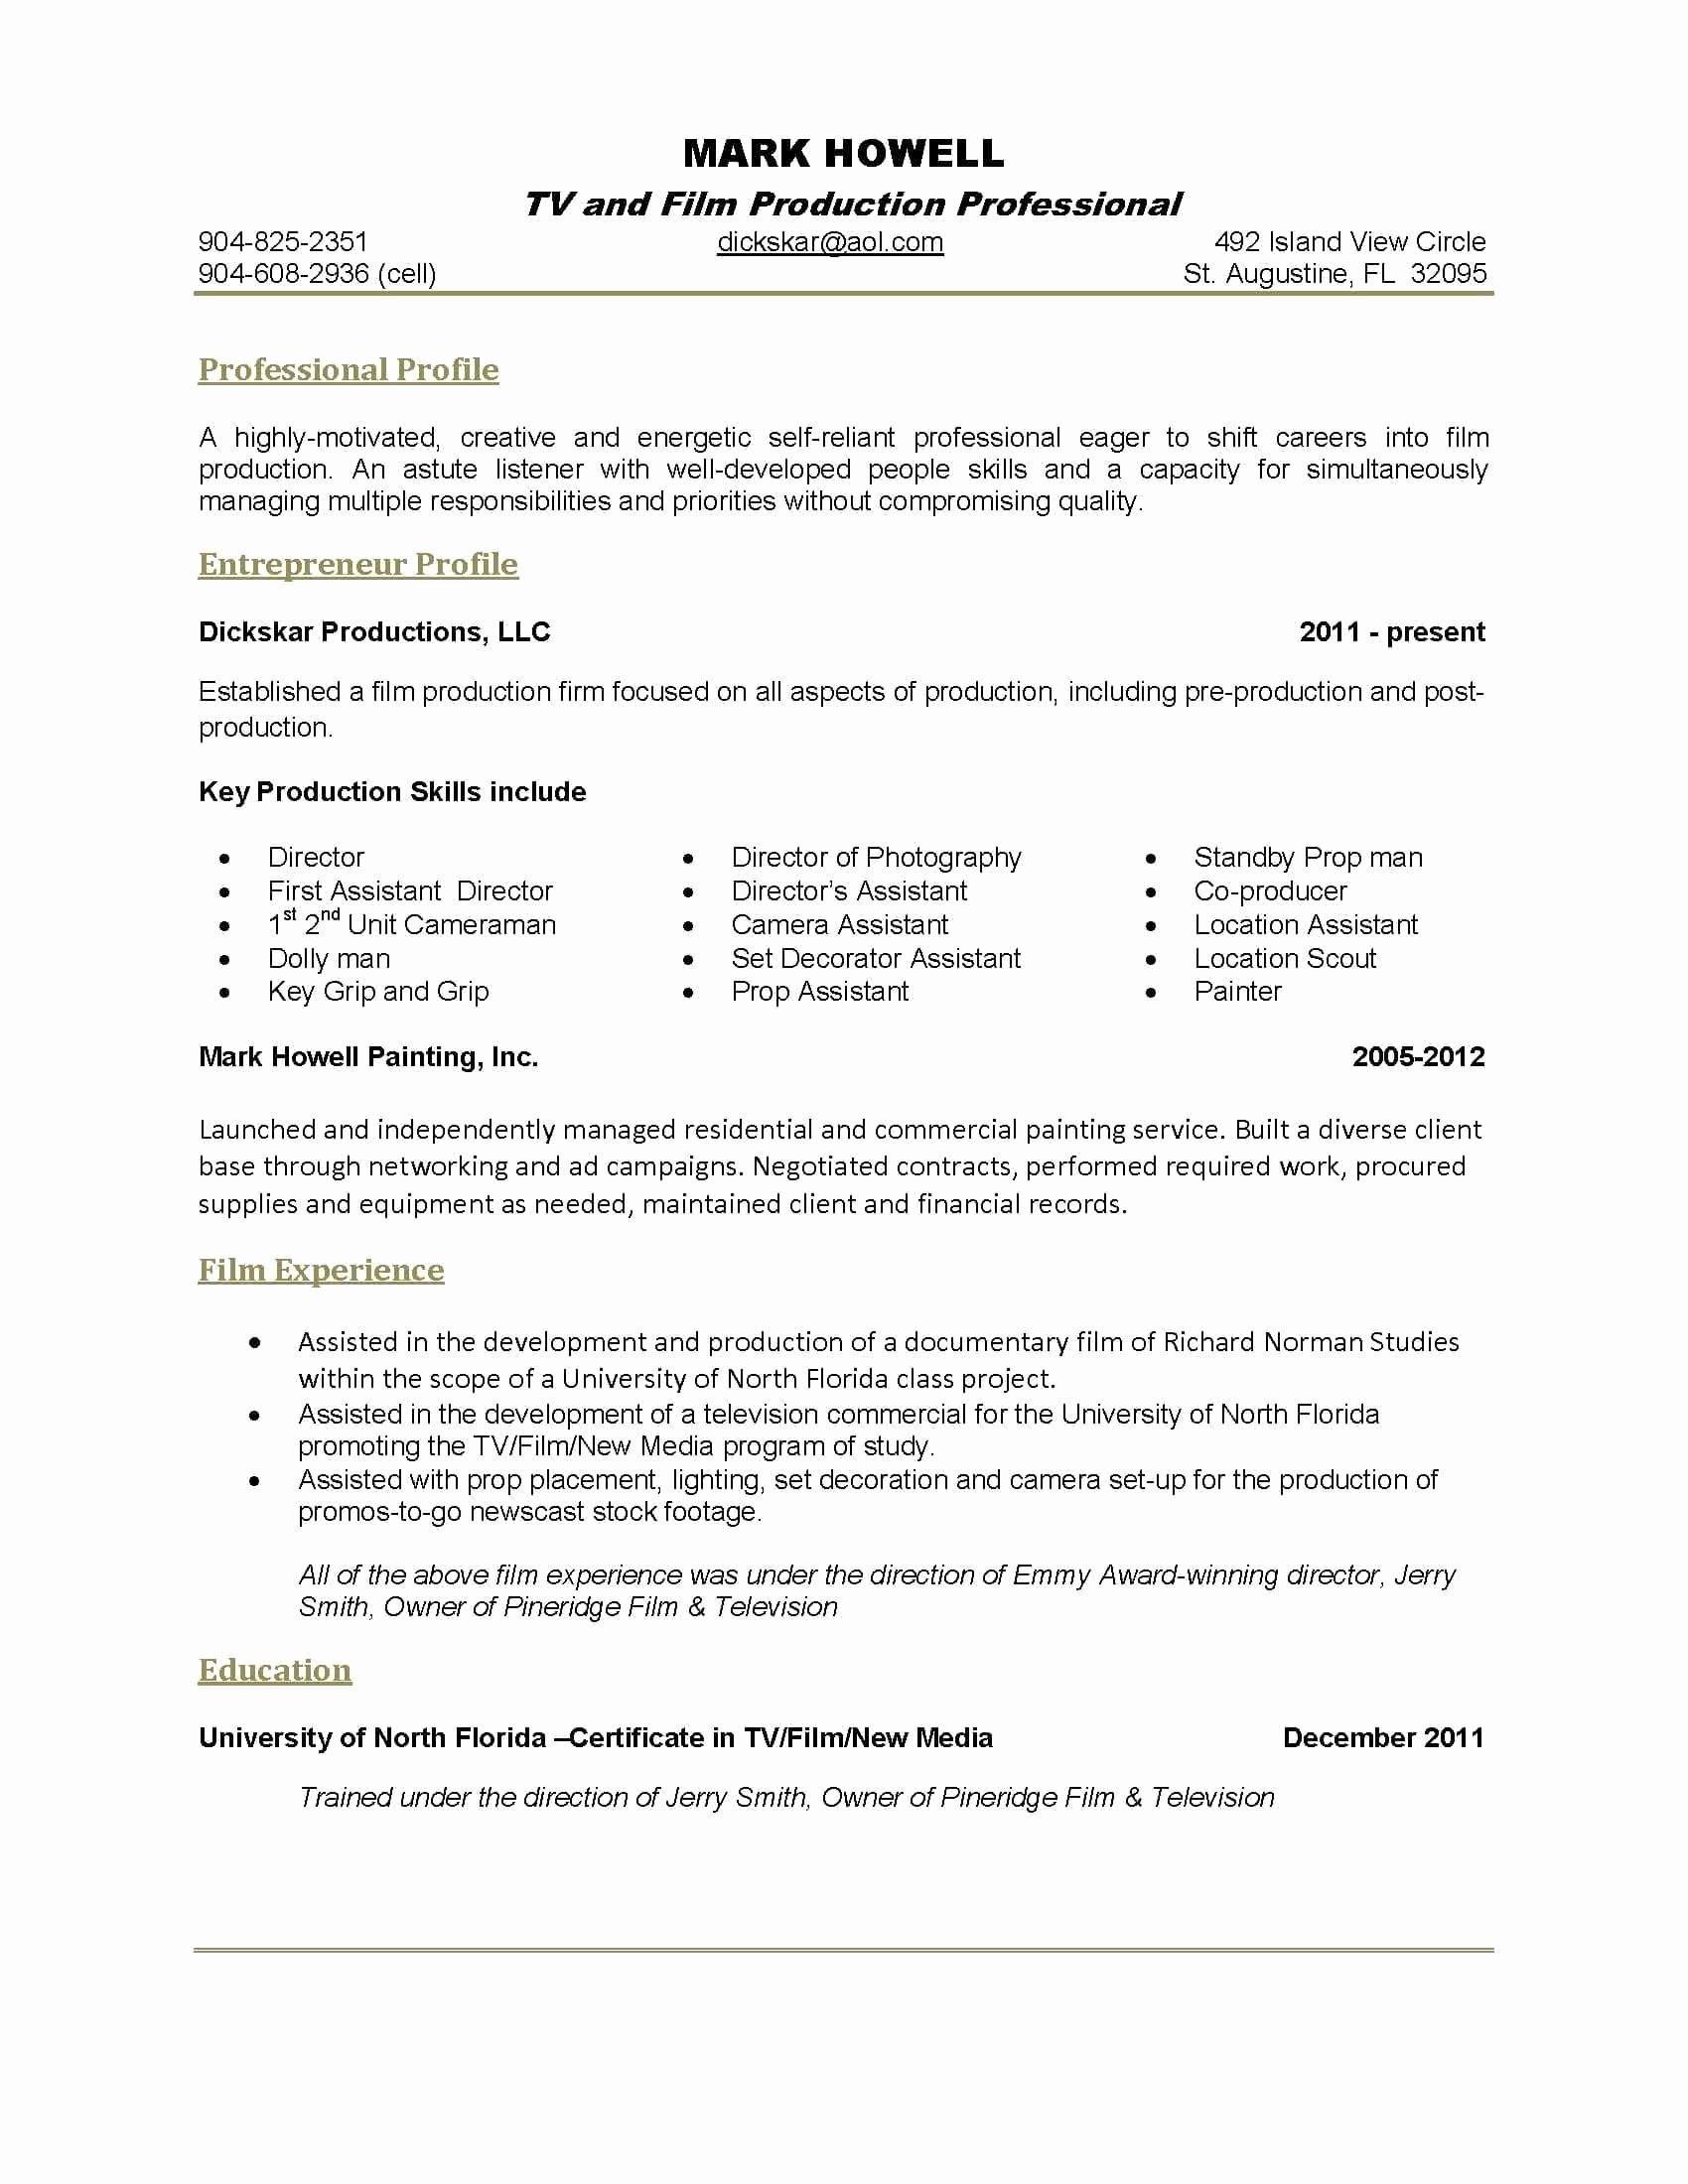 Exelent Professional Resume Wizard Free Ponent